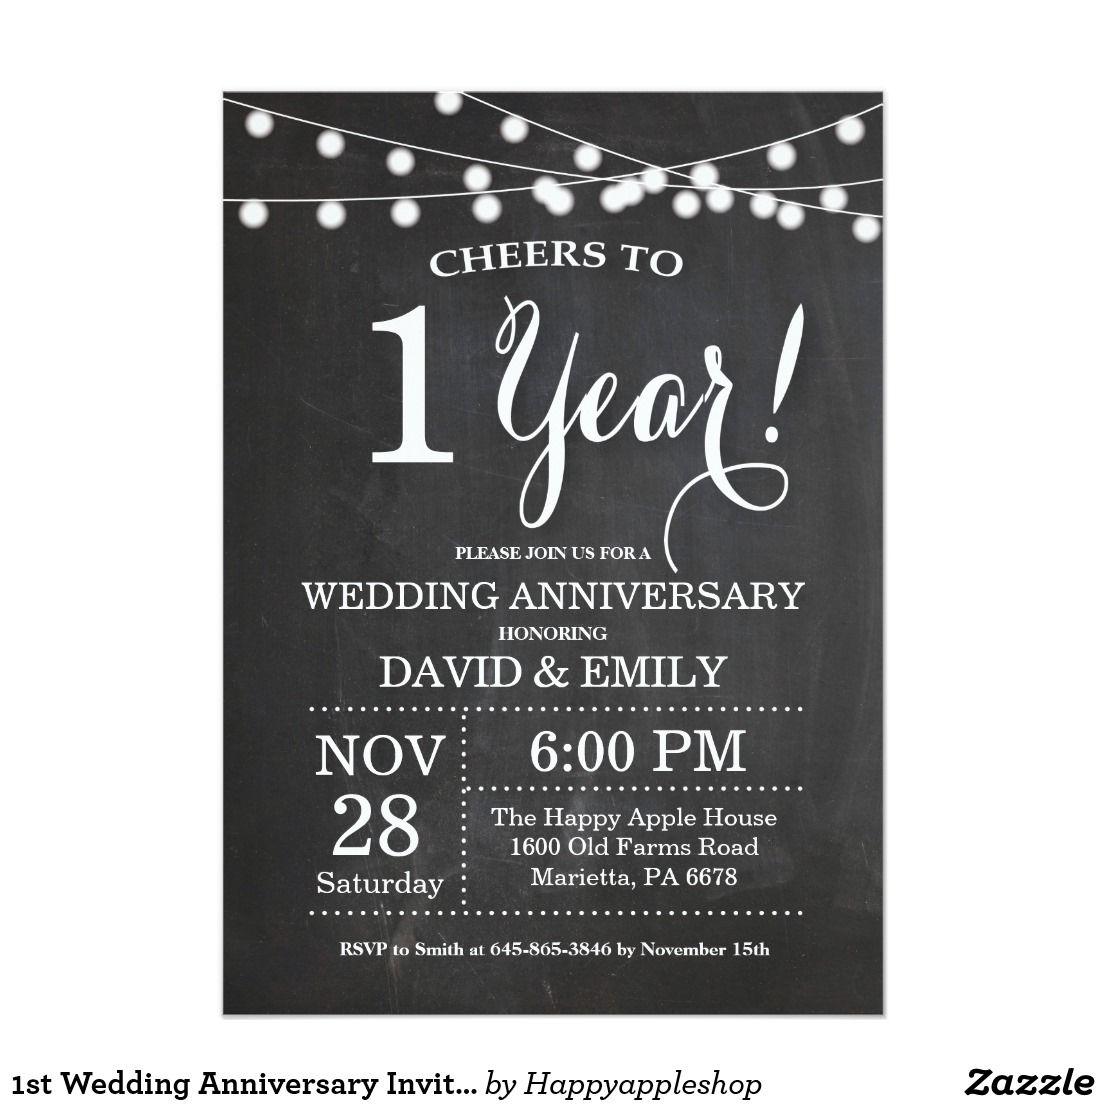 1st Wedding Anniversary Invitation Chalkboard Zazzle Com Anniversary Invitations 90th Birthday Invitations Wedding Anniversary Invitations